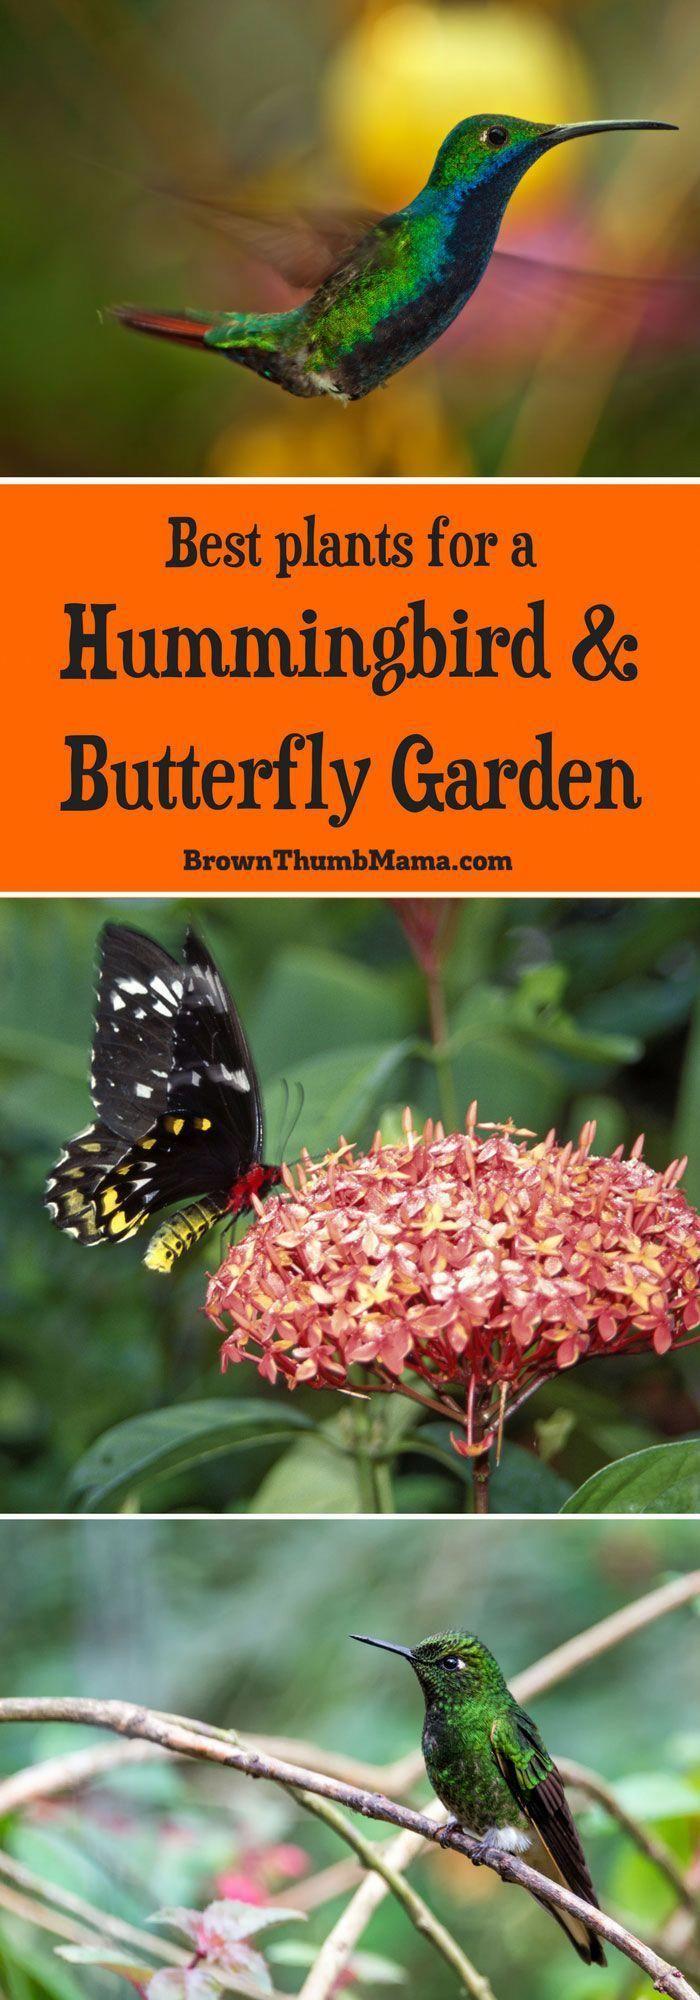 Create a garden that attracts butterflies and hummingbirds ...